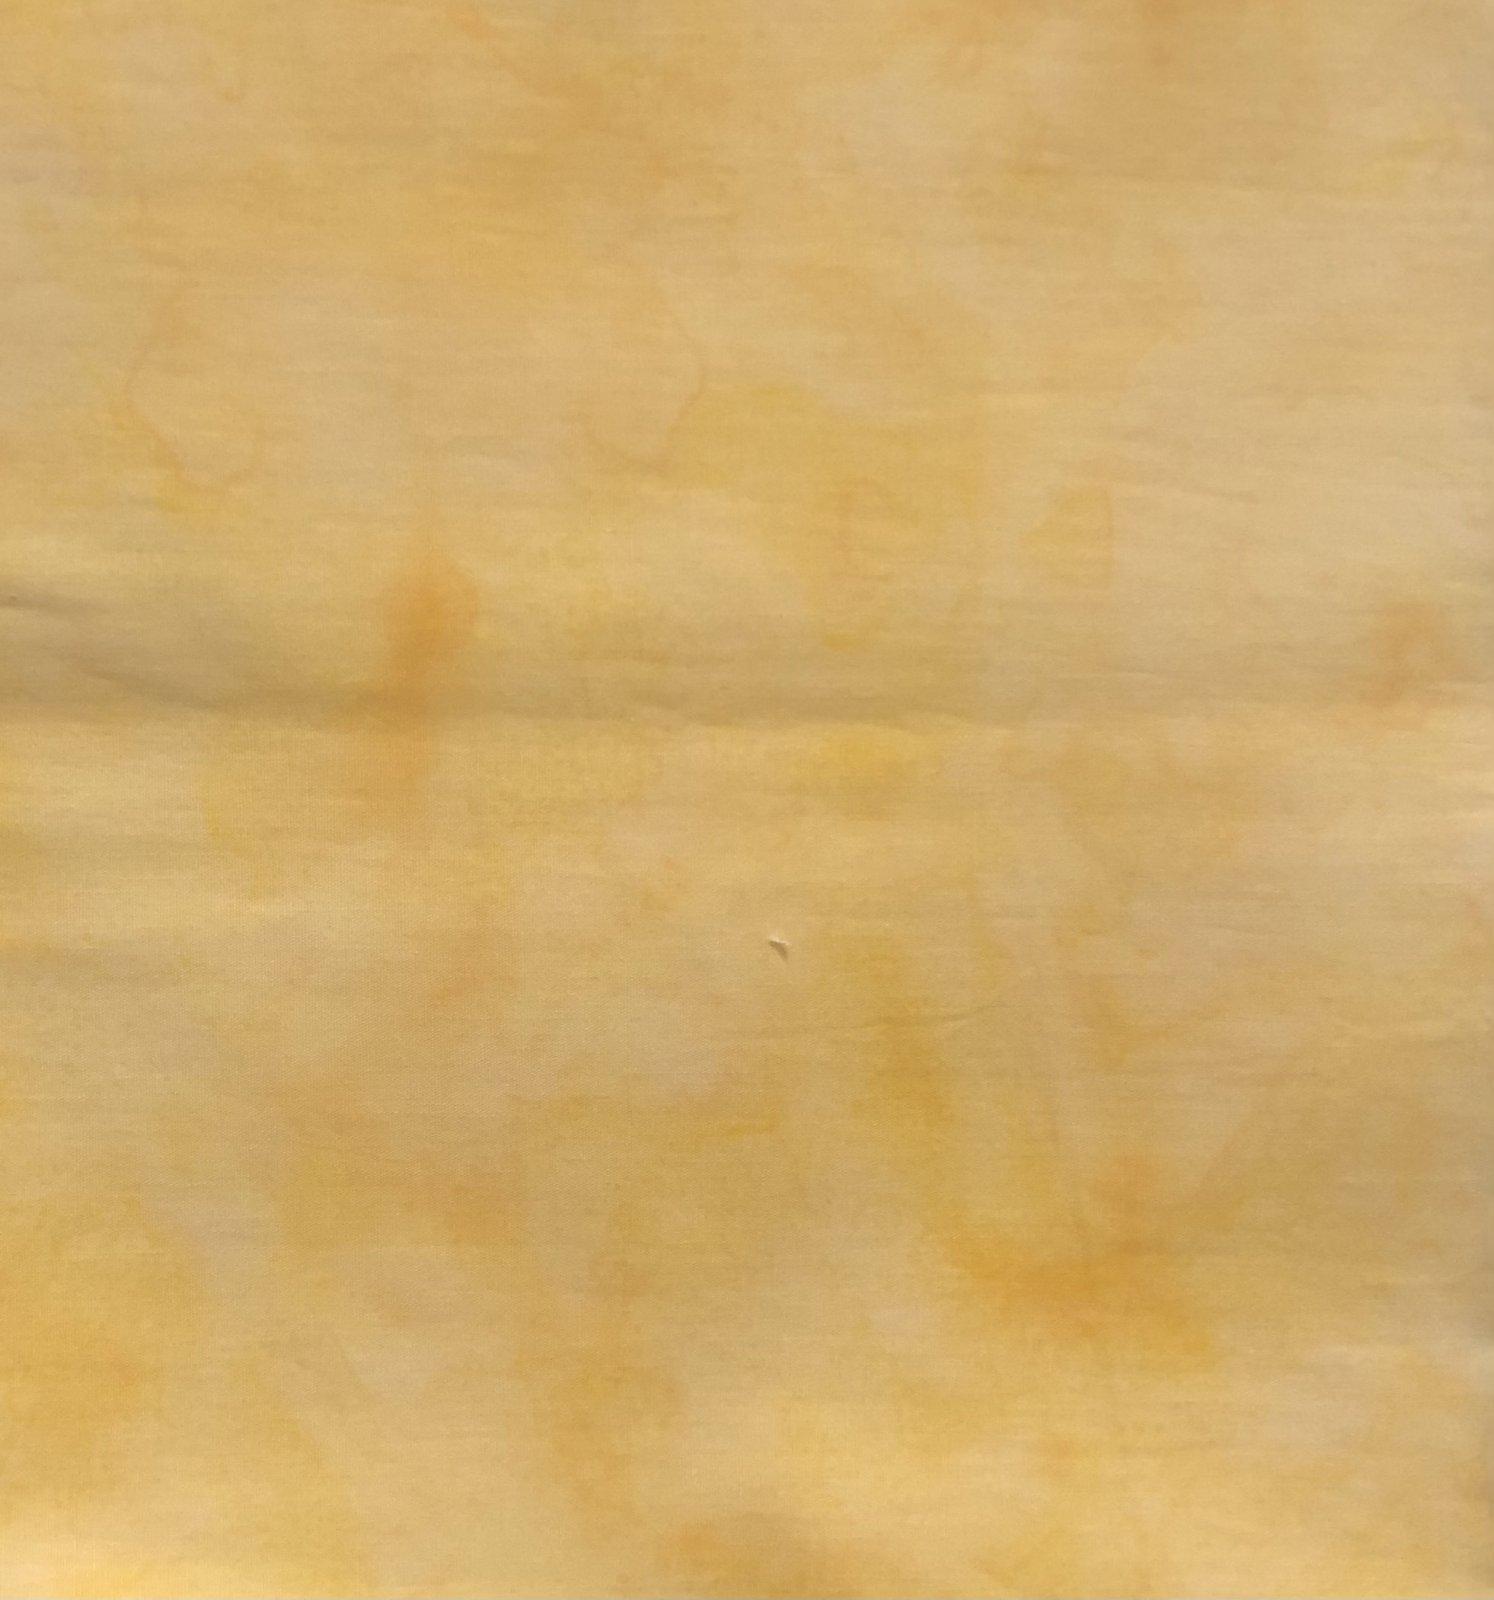 1 yd Remnant Yellow-Orange Blender Batik